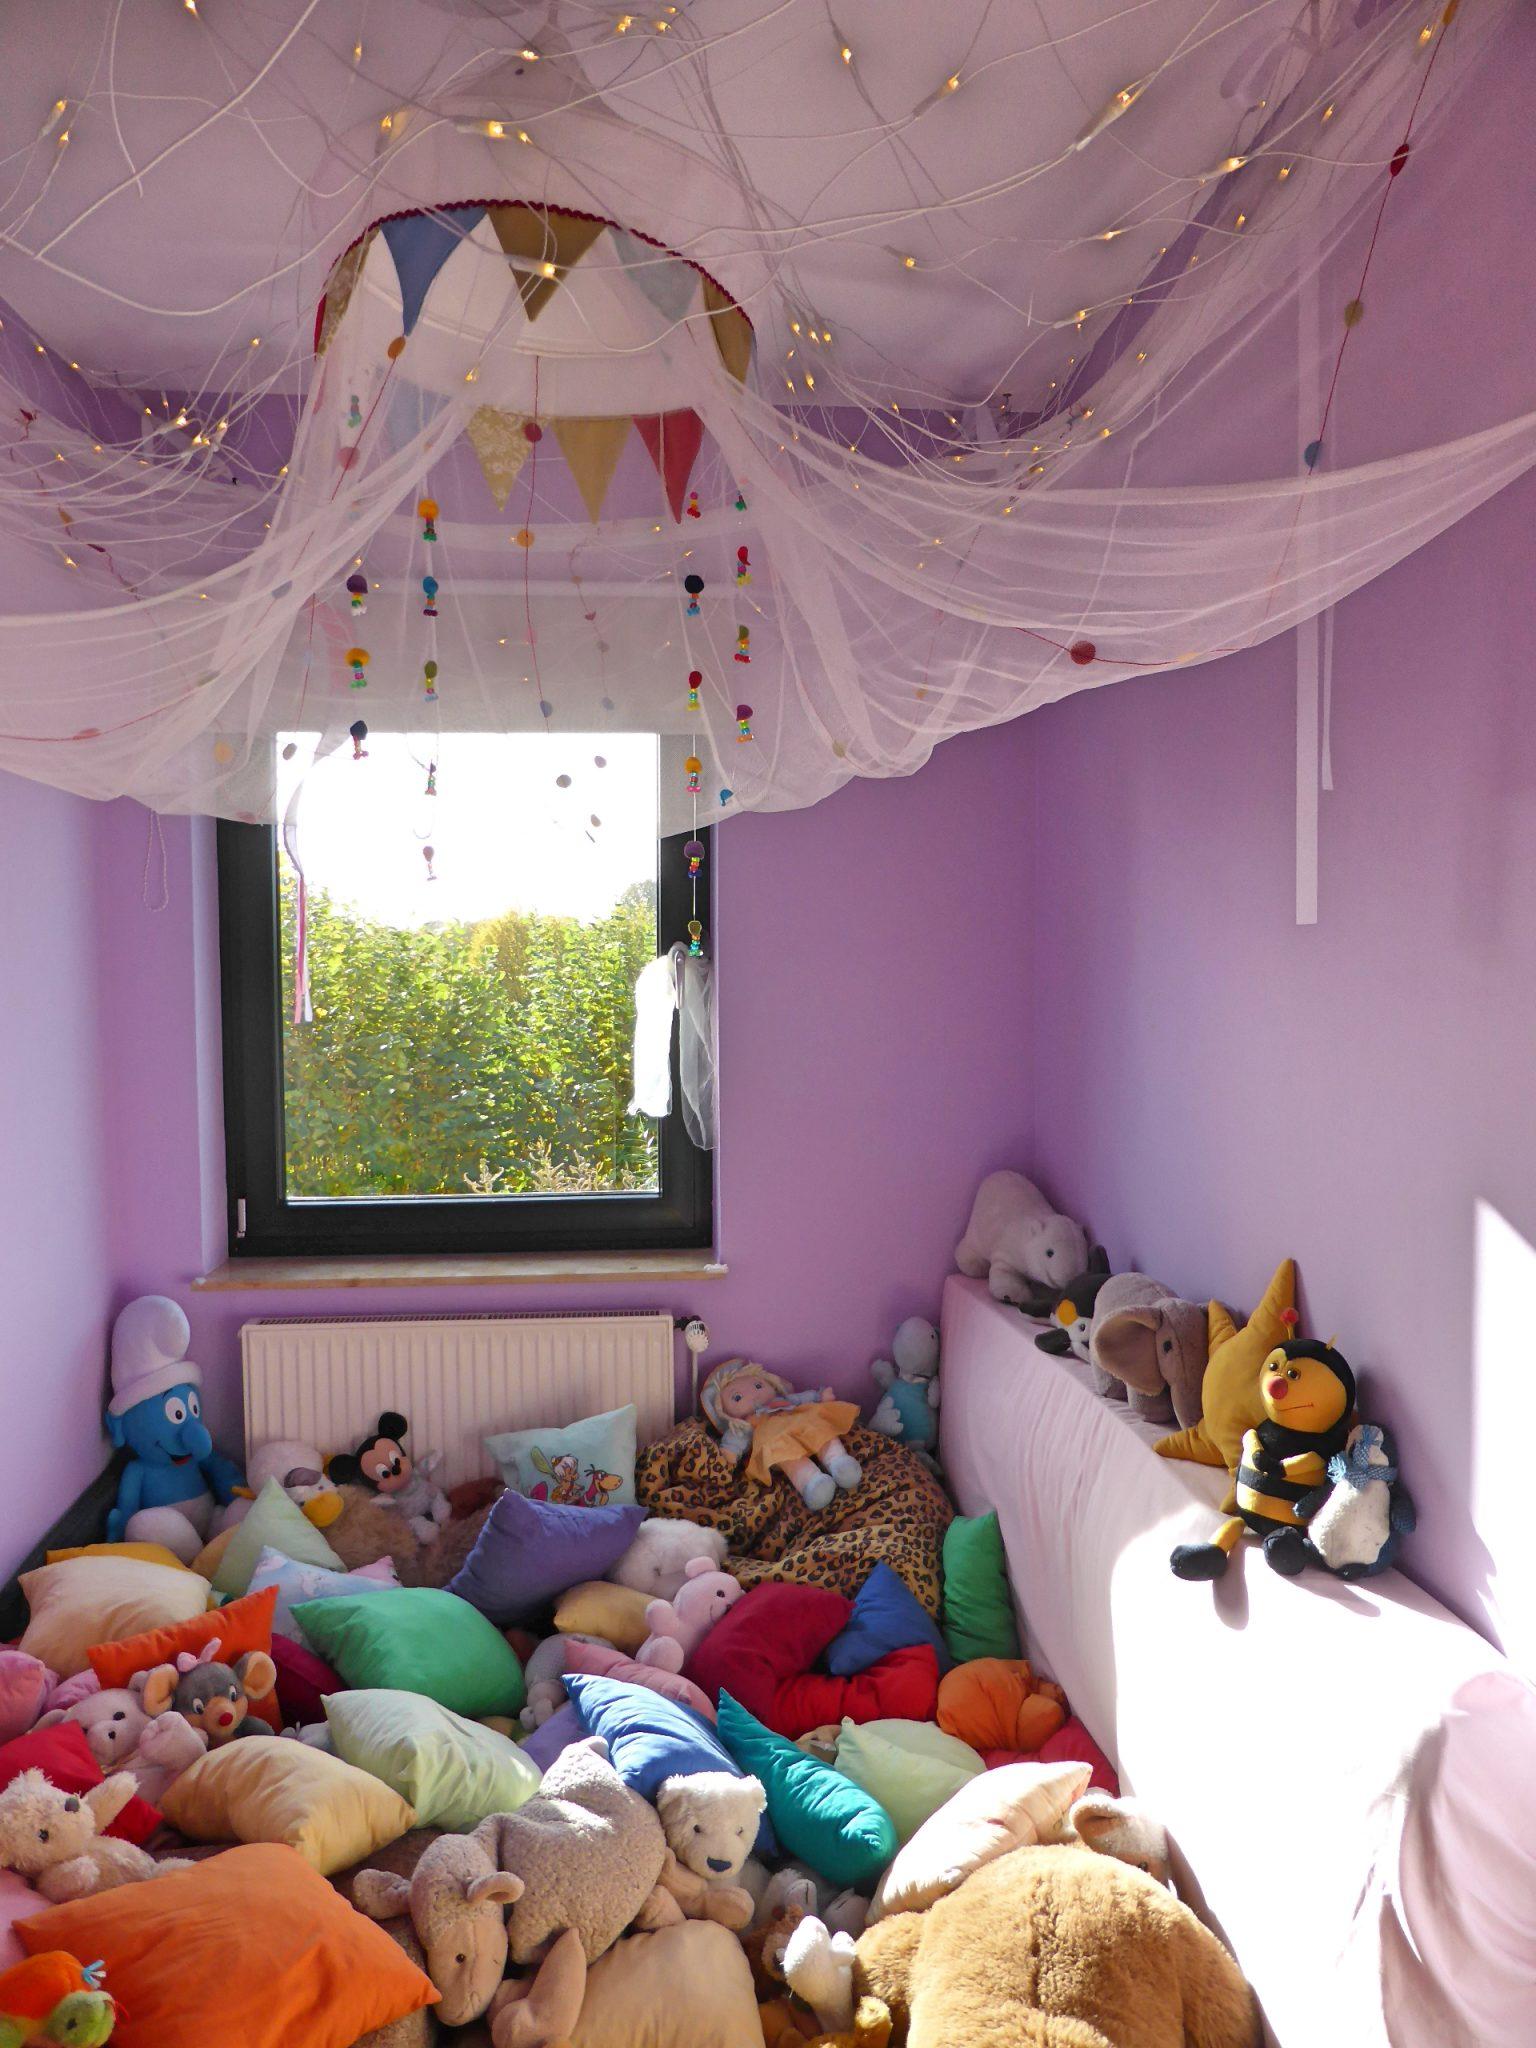 Snozzle 7 Kita Kid Zone Kinderbetreuung - Snoozleraum